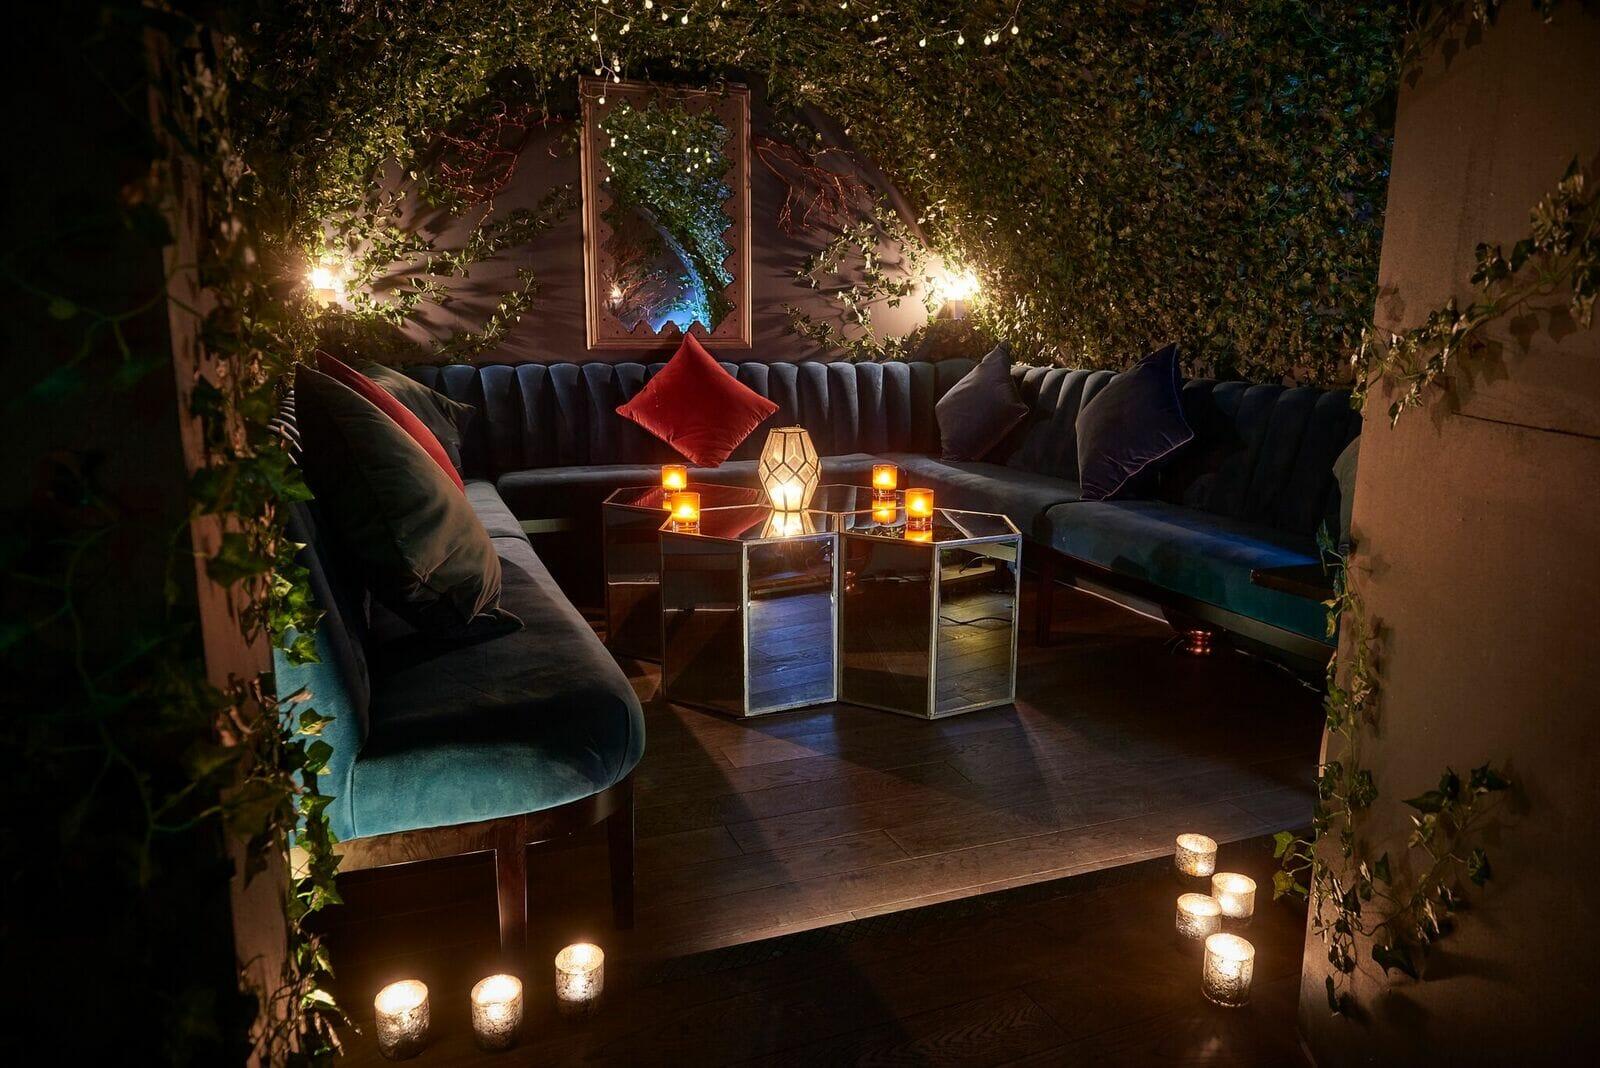 Eve best Covent Garden bars